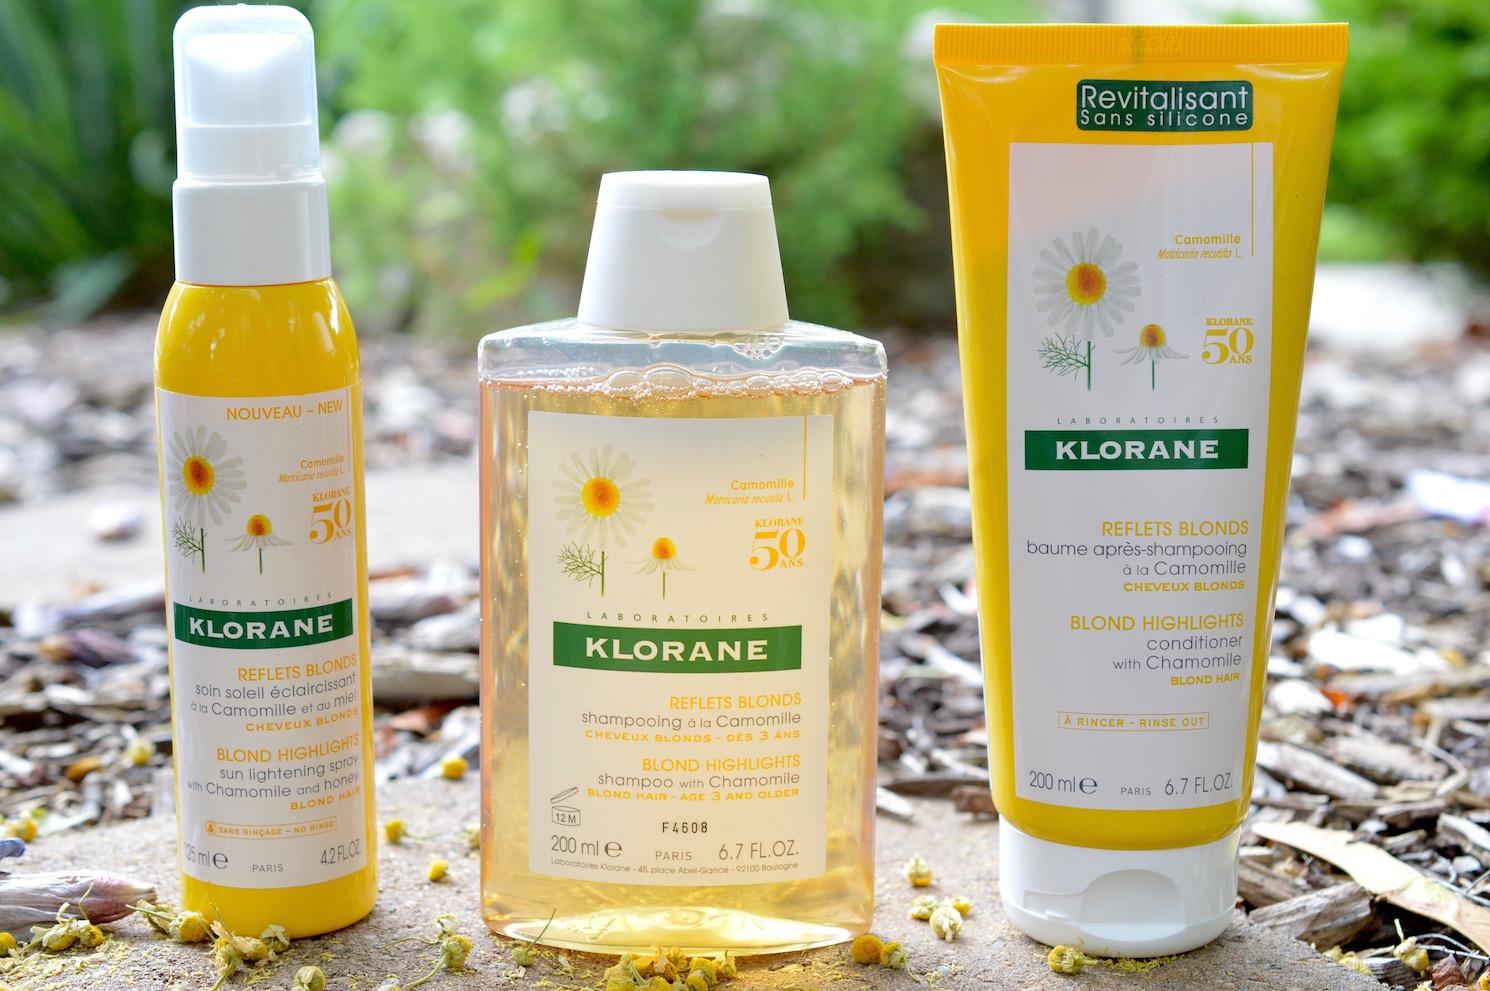 Klorane Lightening Shampoo